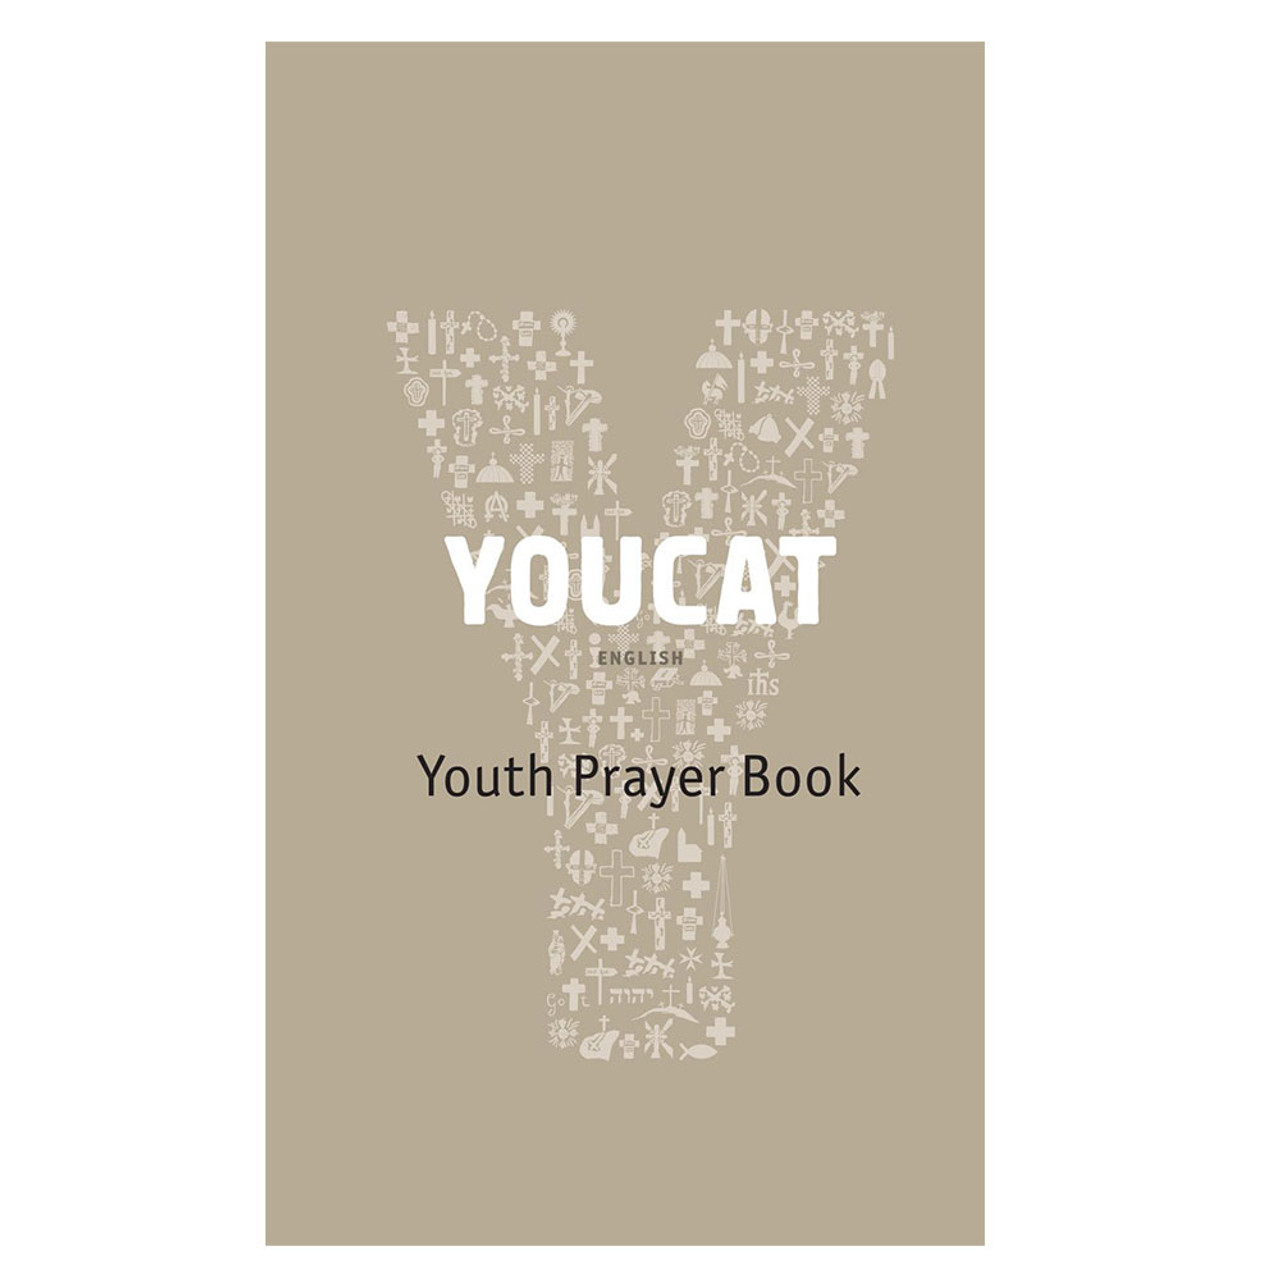 You Cat Youth Prayer Book Schoenborn, Christoph